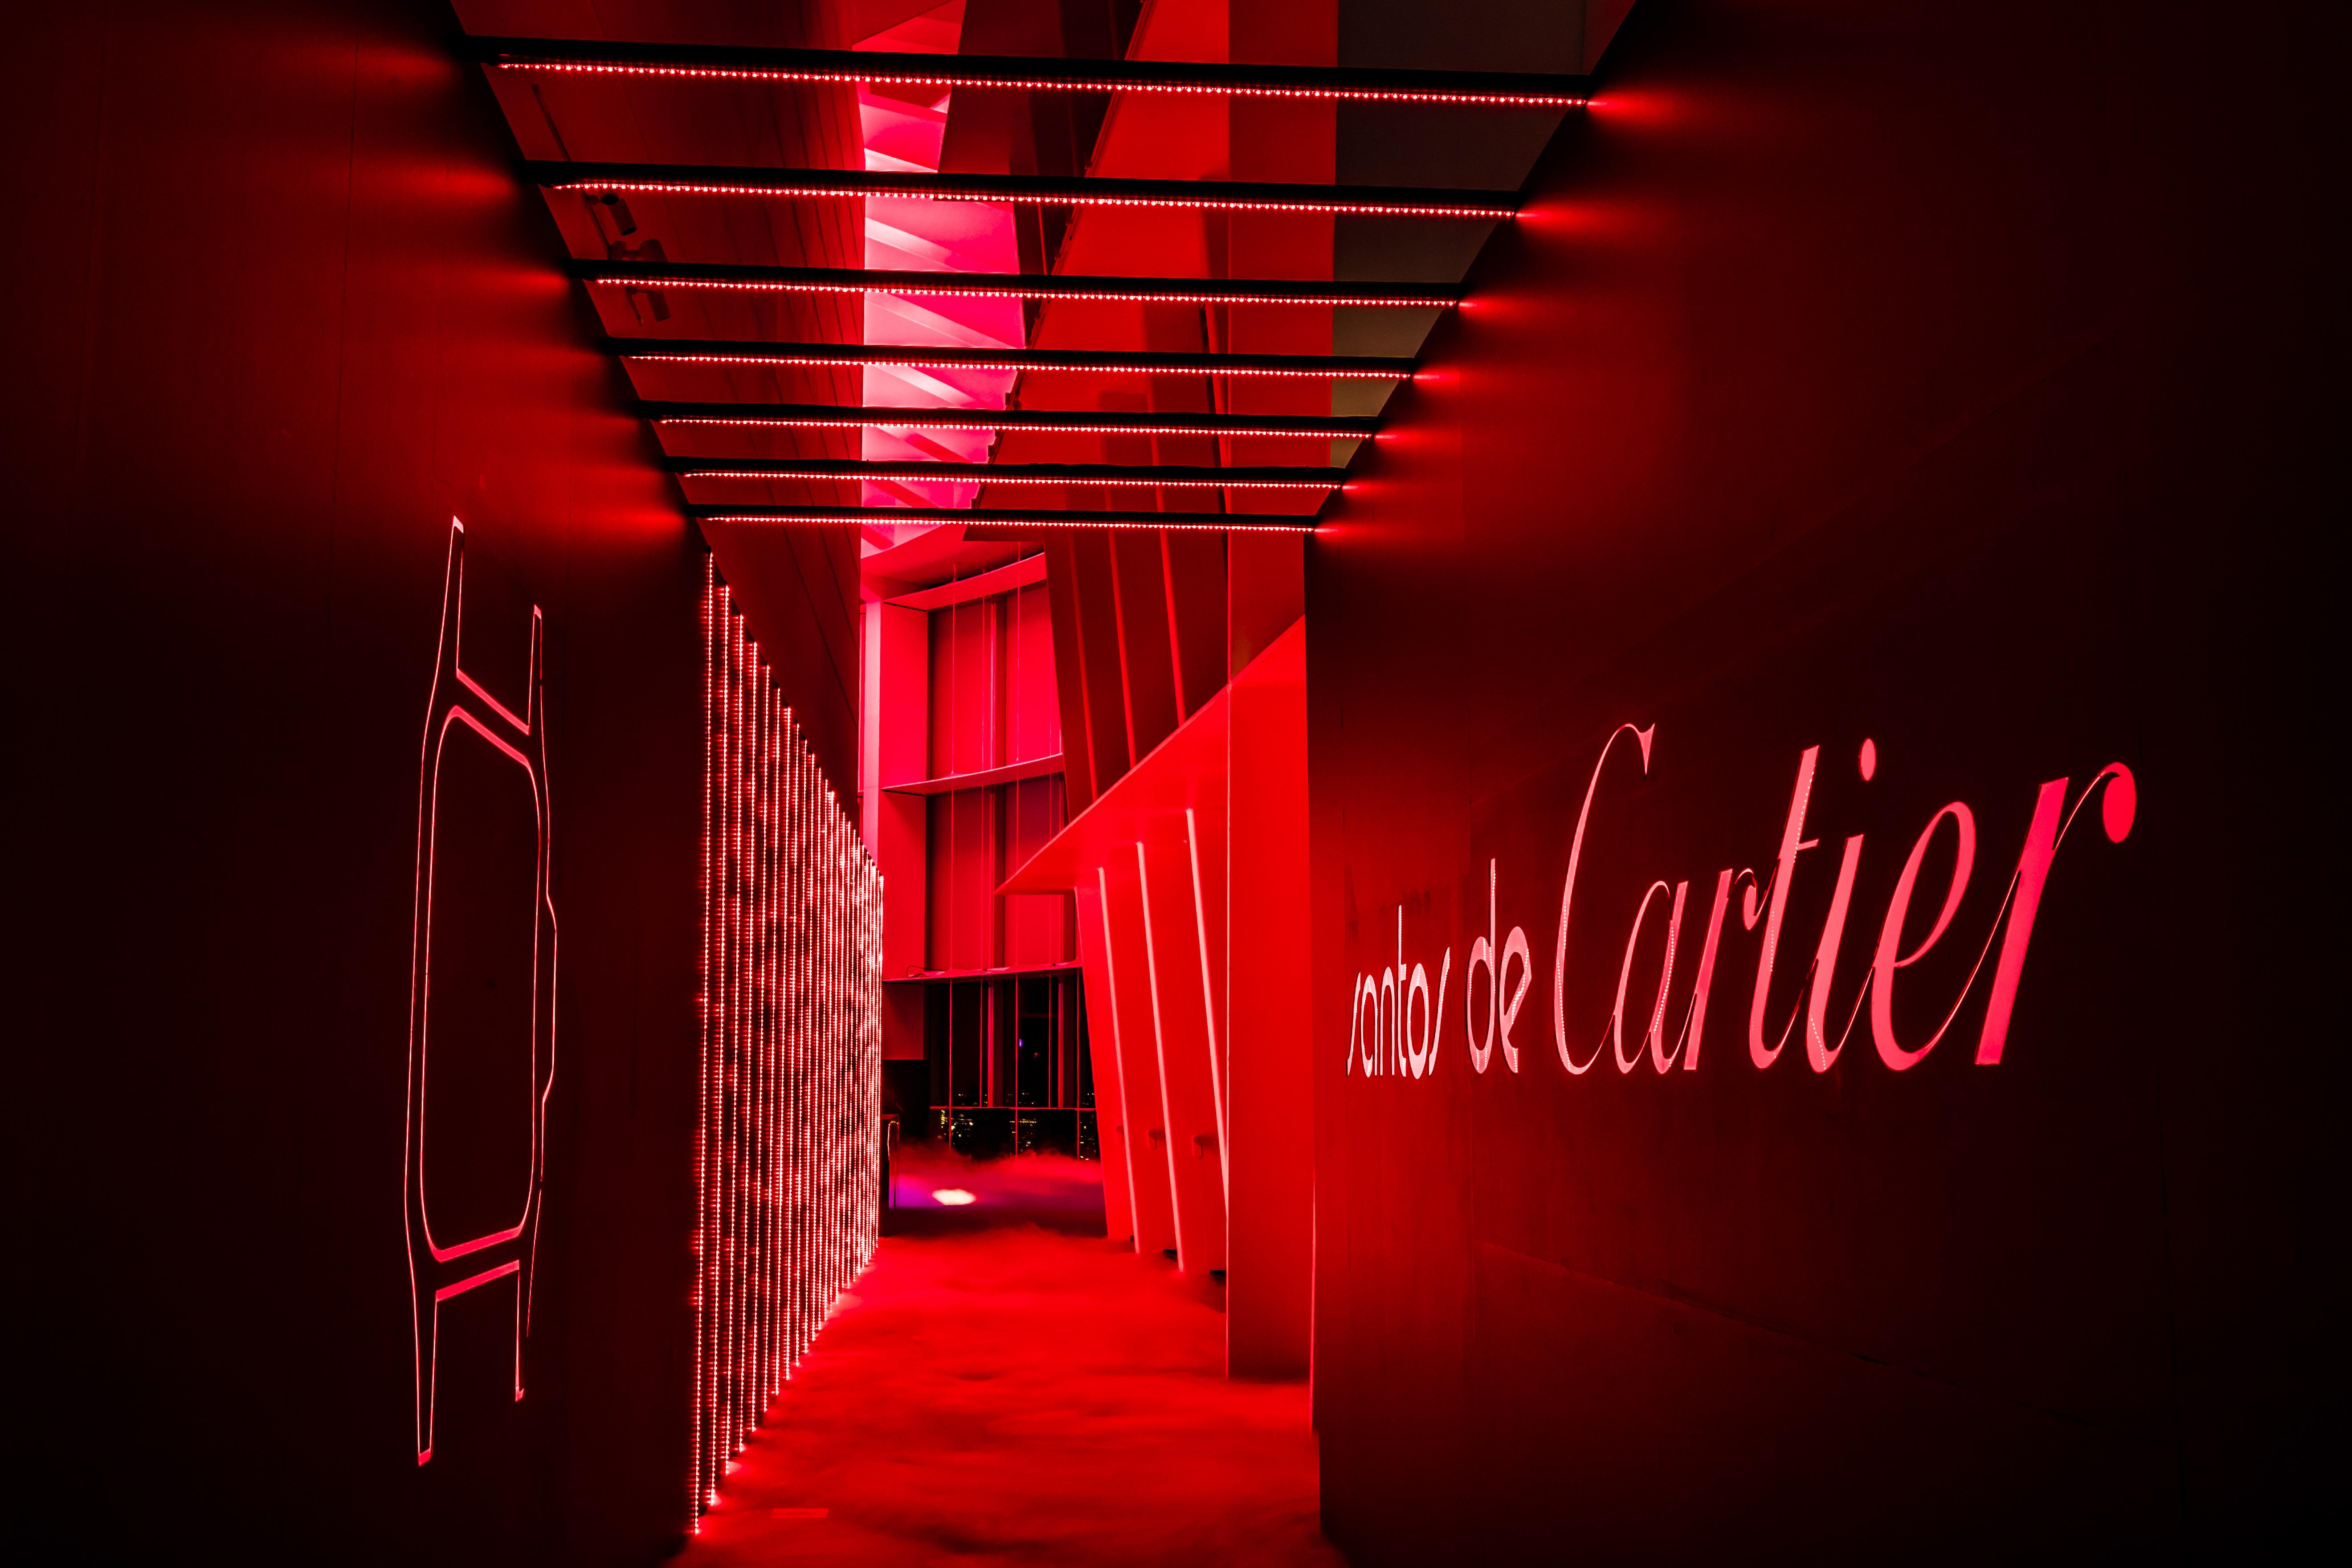 Santos de Cartier Party (Cartier)